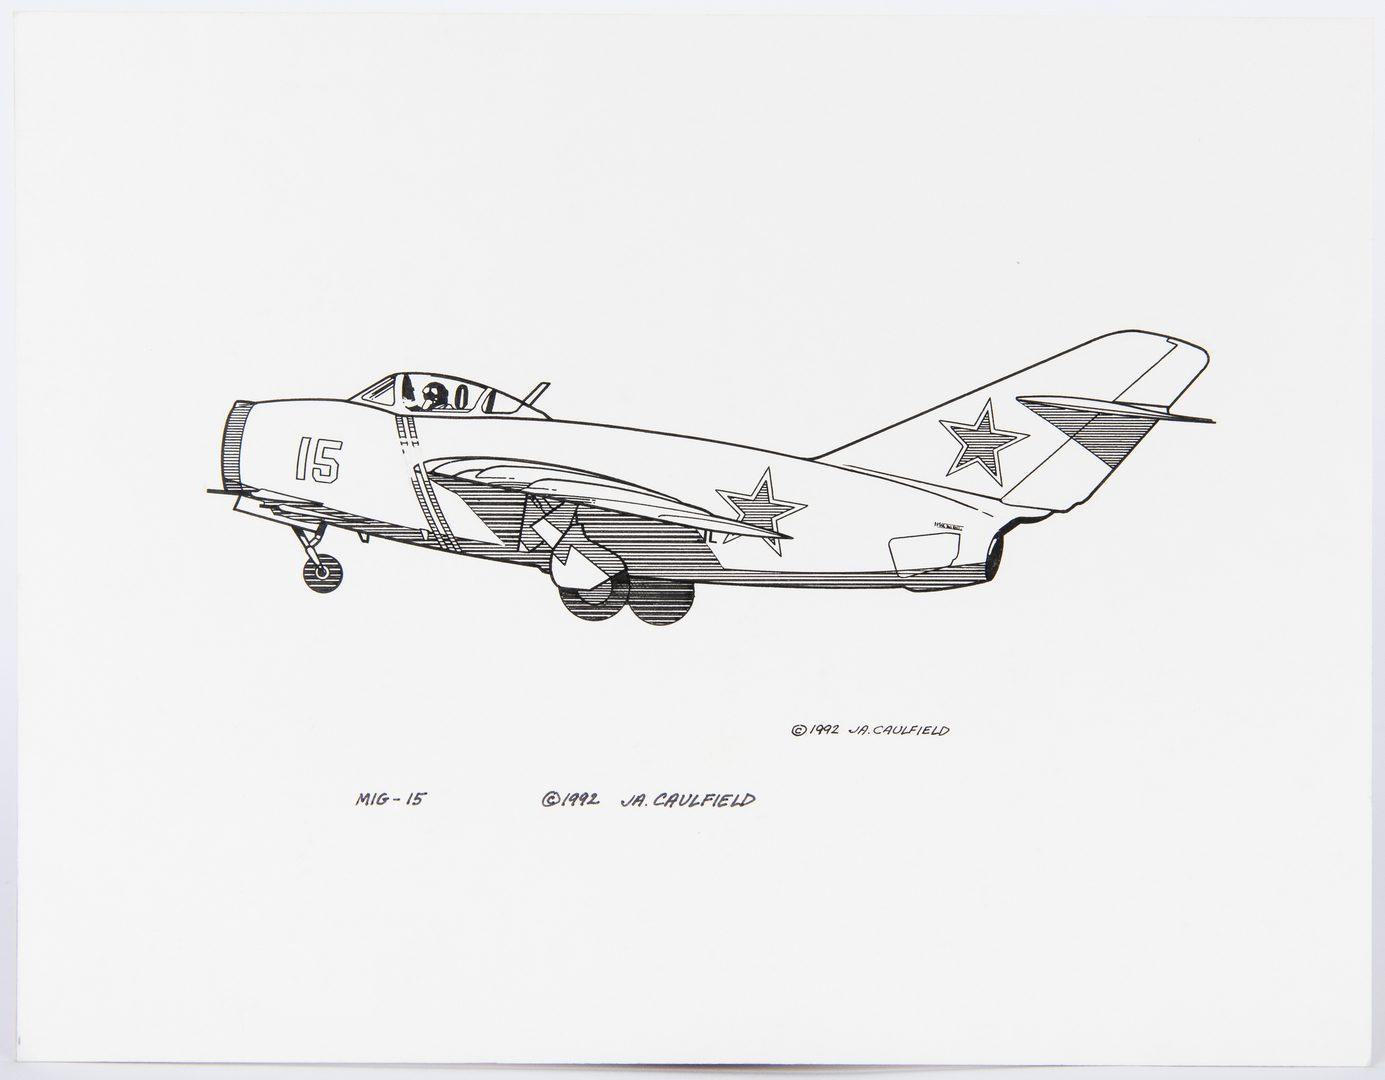 Lot 144: James Caulfield Aviation Artworks, 15 items